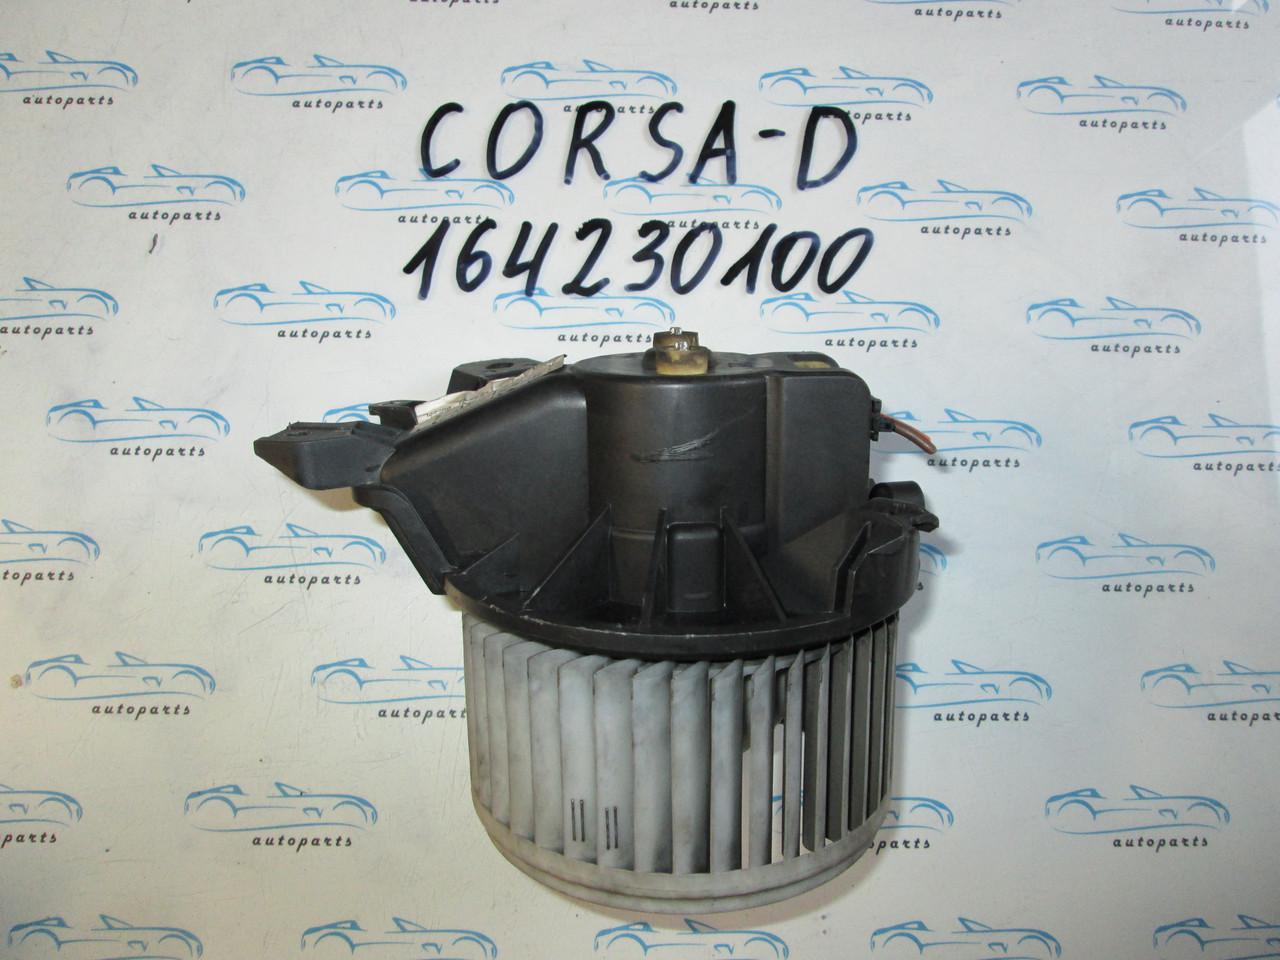 Вентилятор печки опель Корса Д, opel Corsa D 13335075